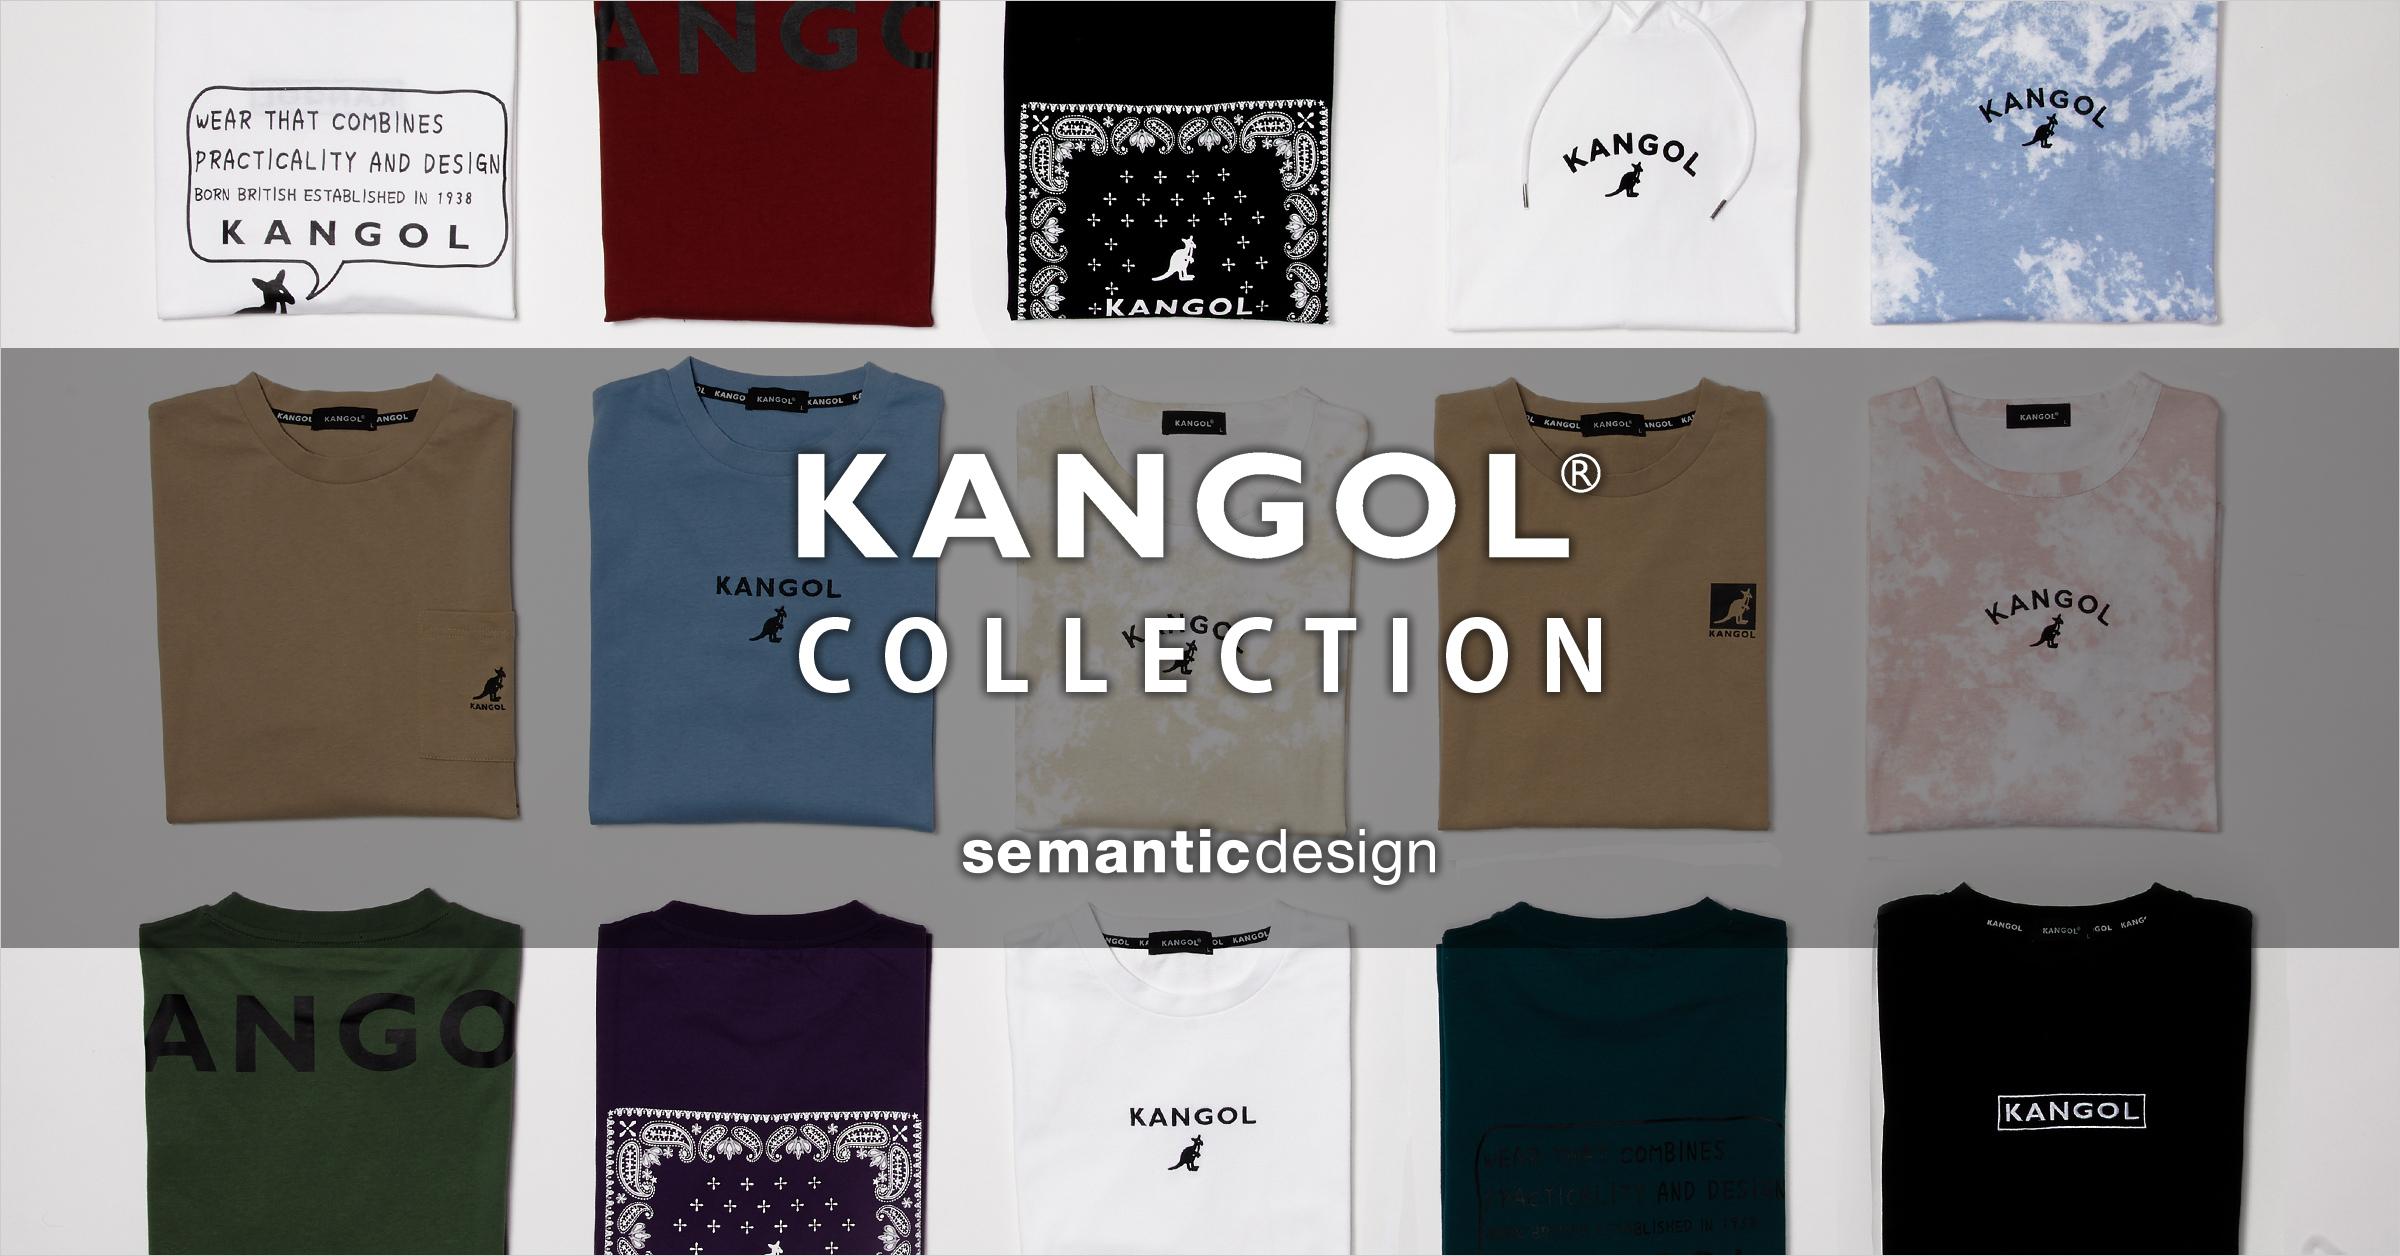 semanticdesign(セマンティックデザイン) KANGOL COLLECTION